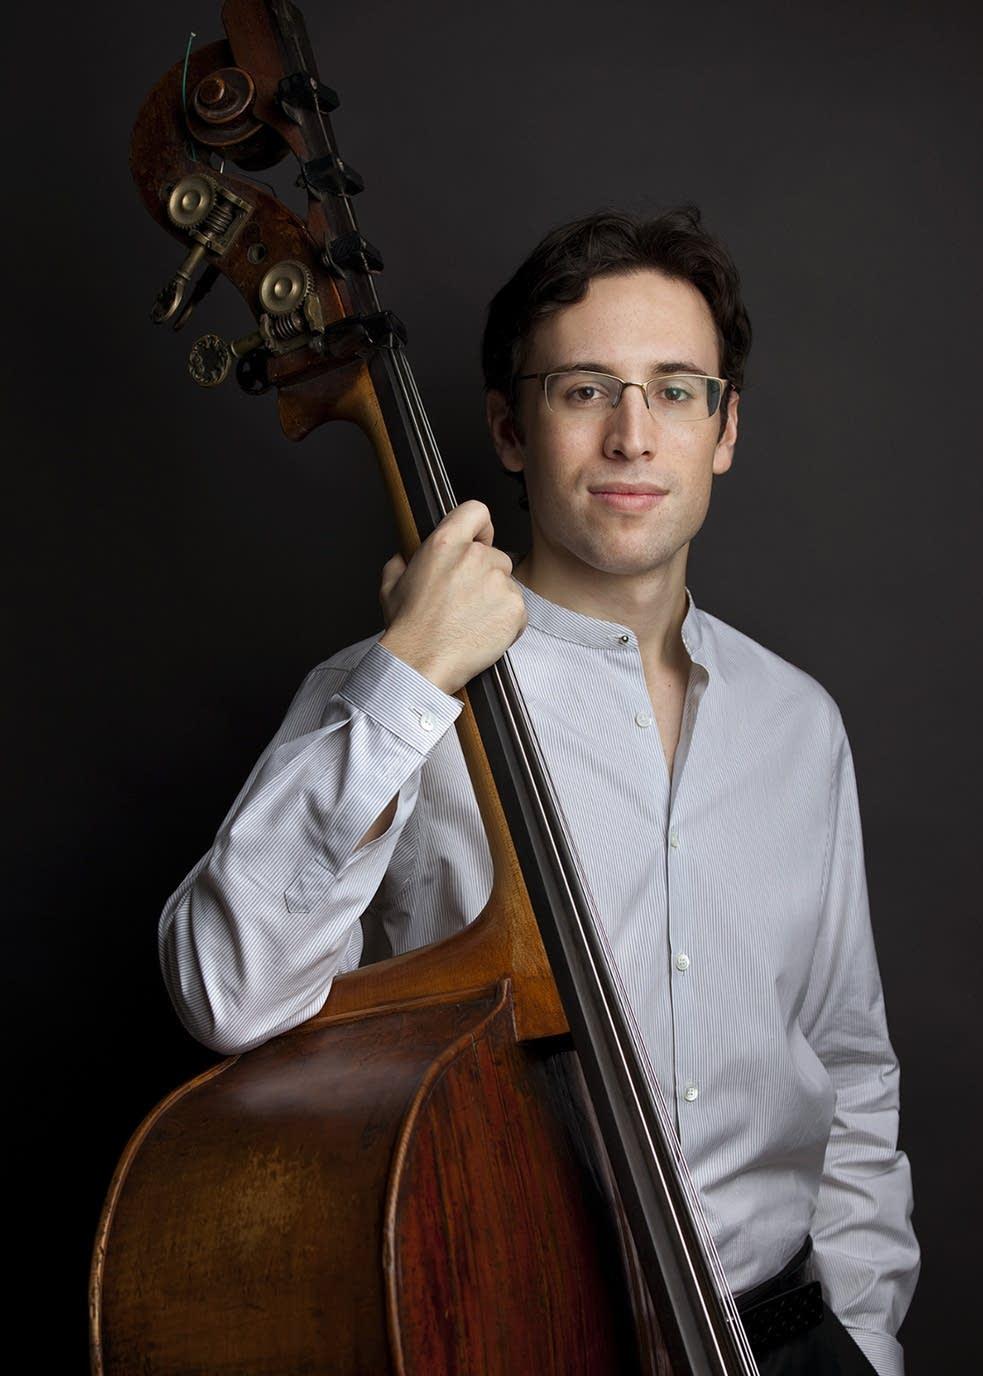 Bassist Zachary Cohen